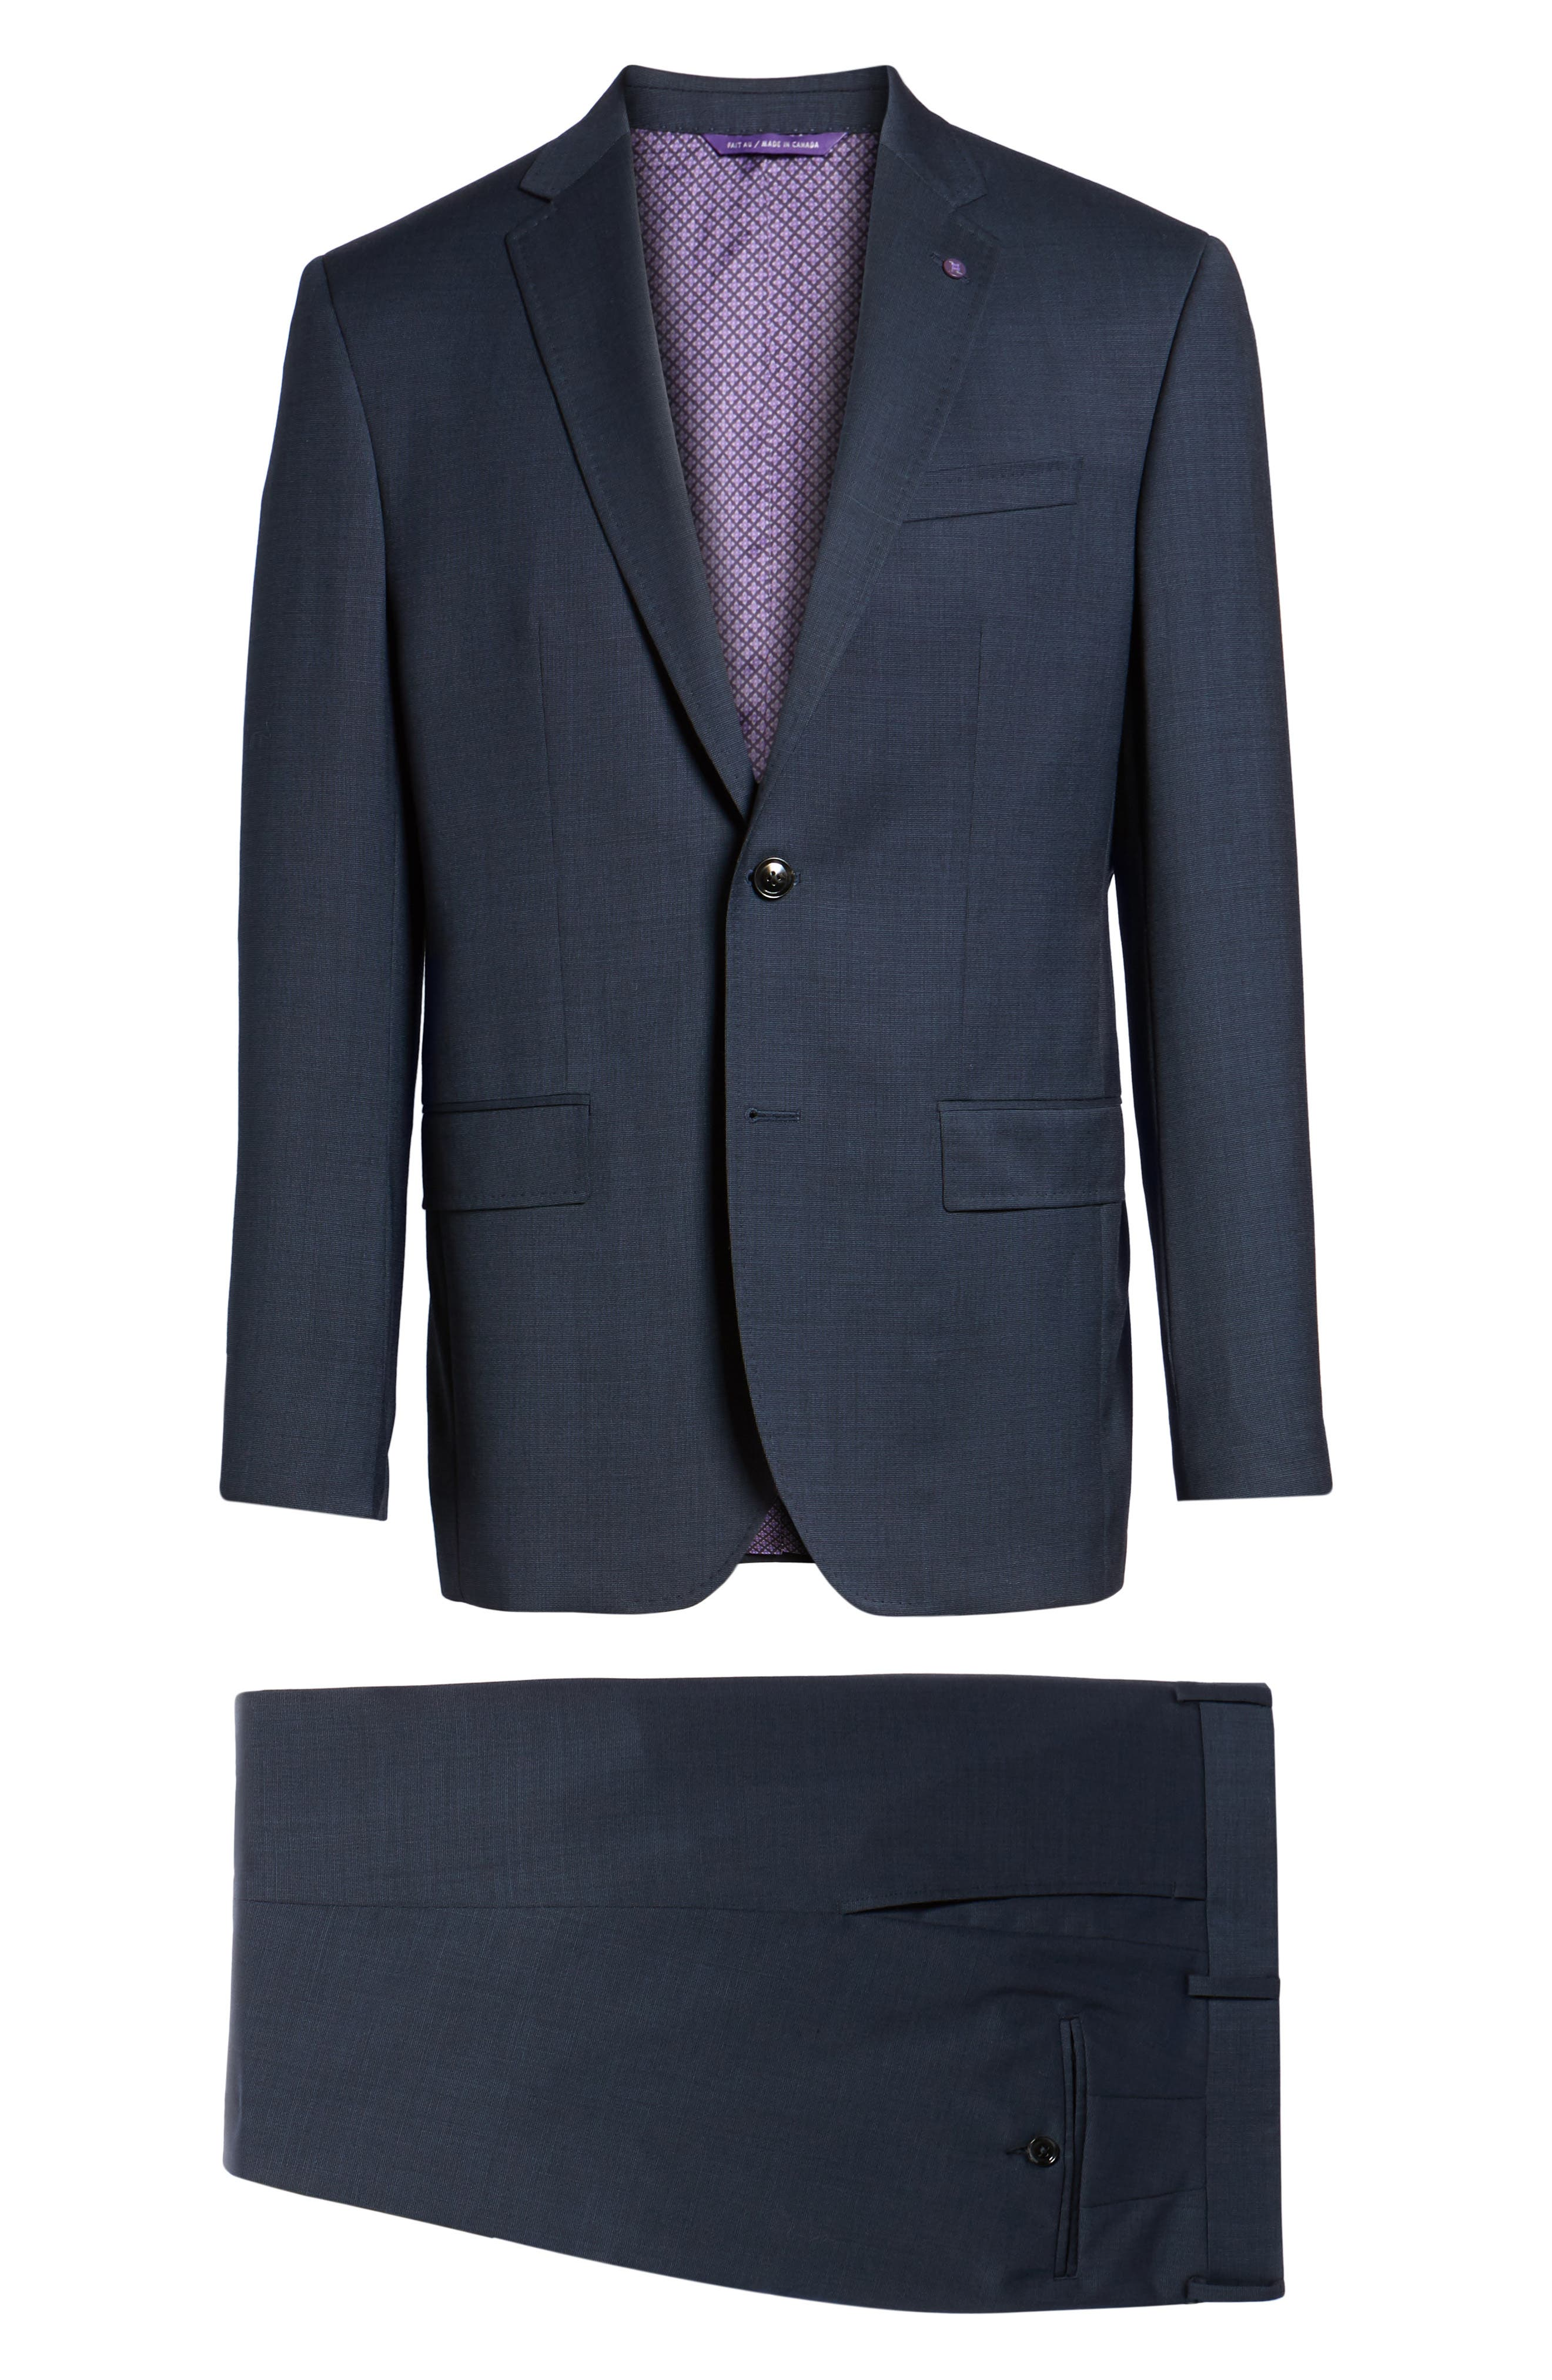 Jay Trim Fit Solid Wool Suit,                             Alternate thumbnail 8, color,